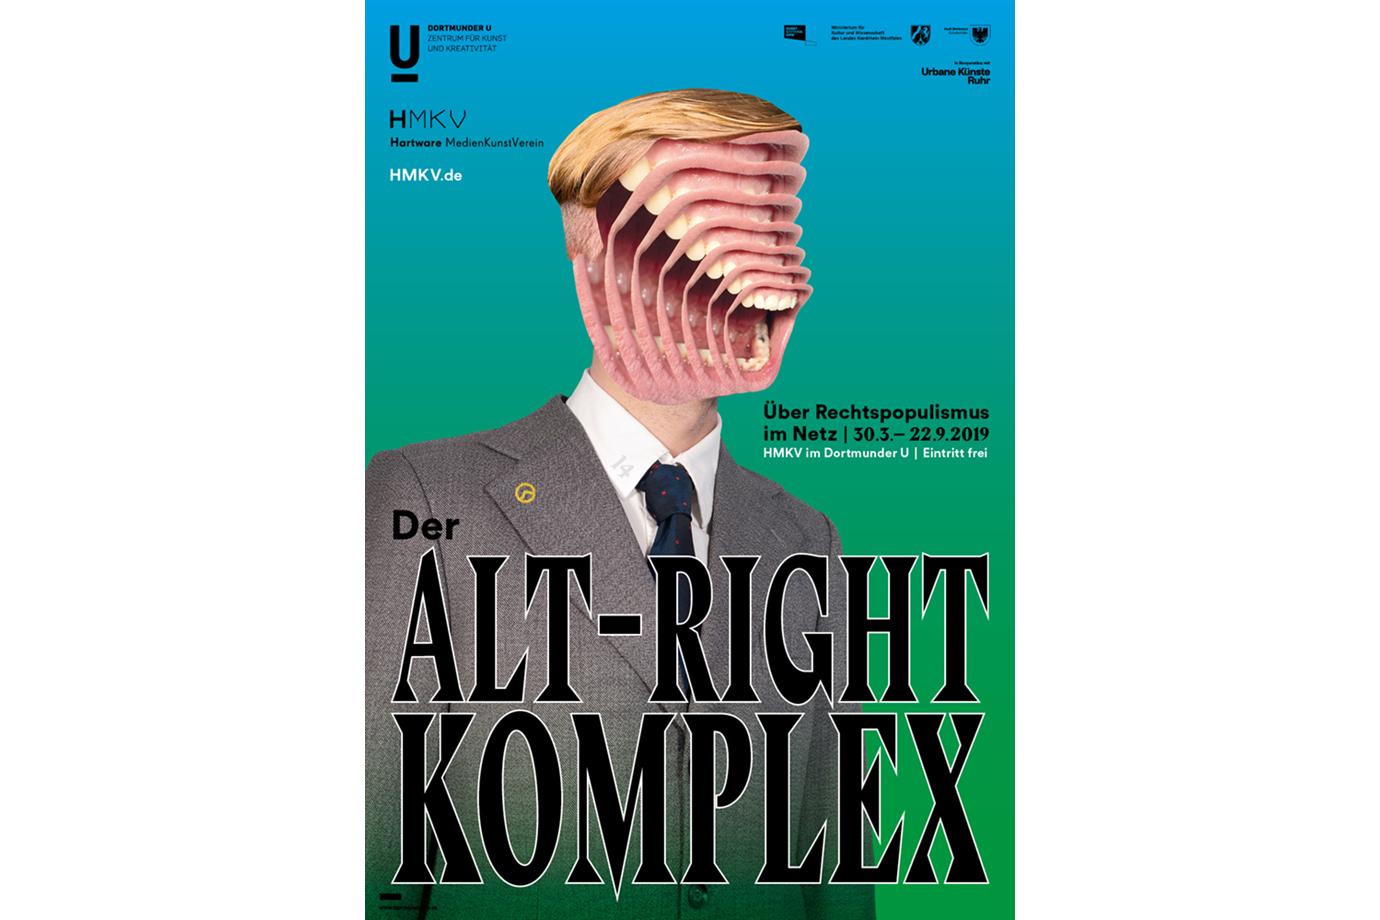 http://e-o-t.de/wordpress/wp-content/uploads/2019/04/2019_eot-ARK-Plakat1b.jpg